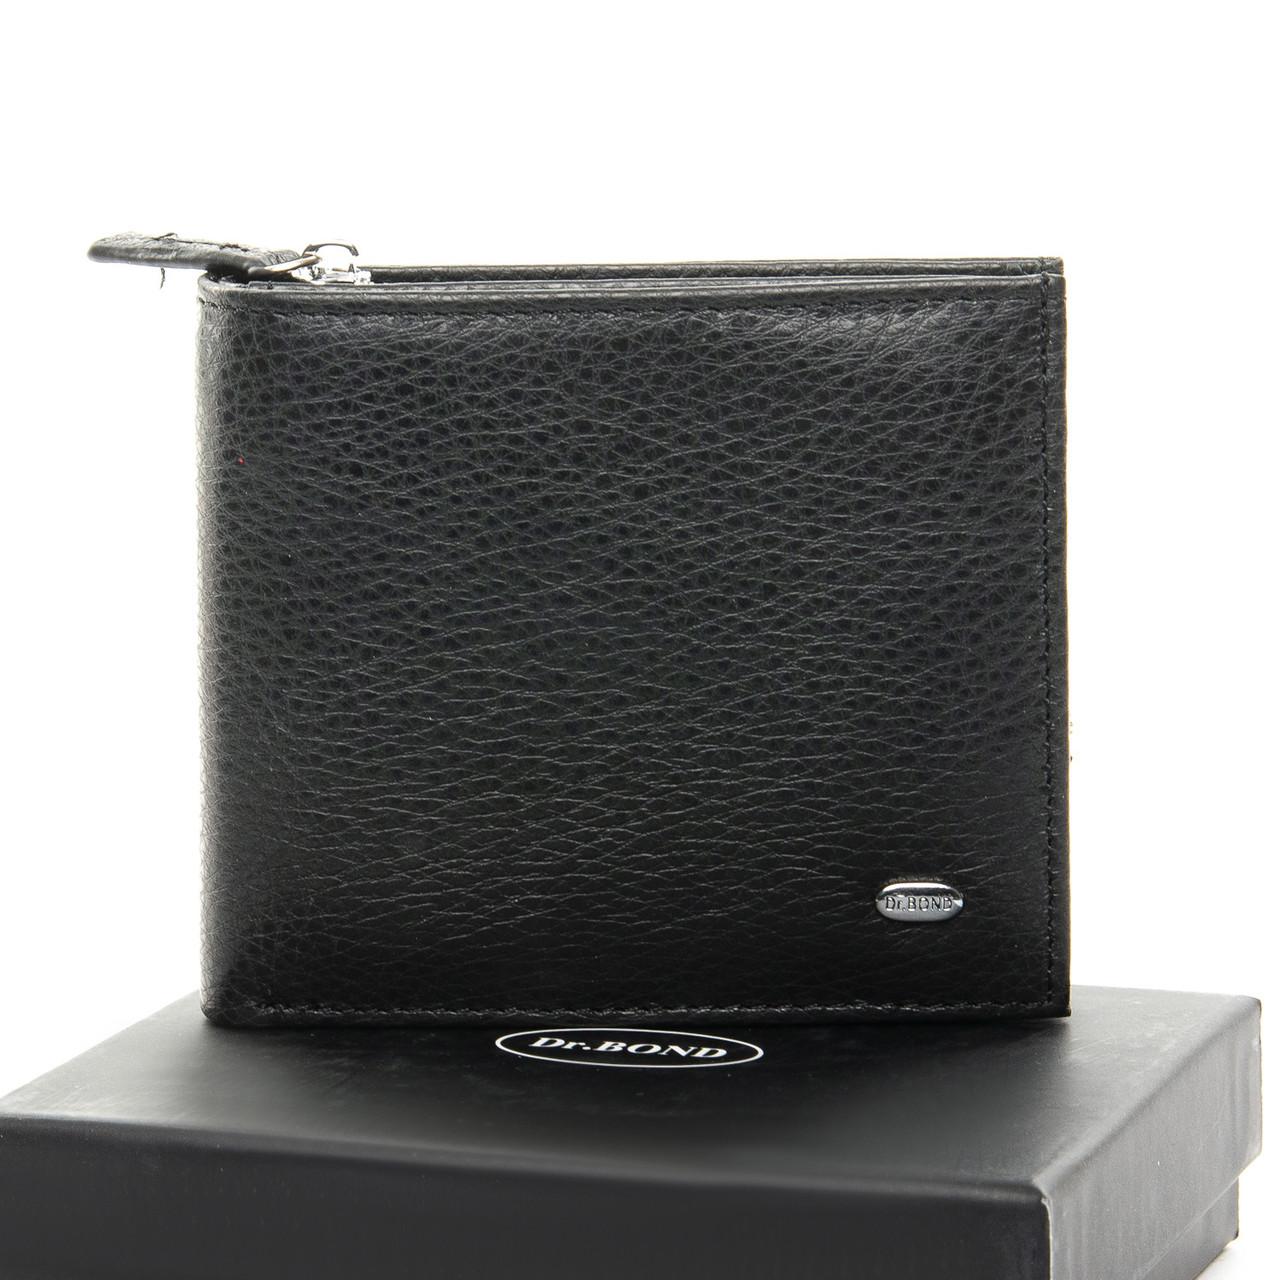 Кошелек Classic кожа DR. BOND M54 black